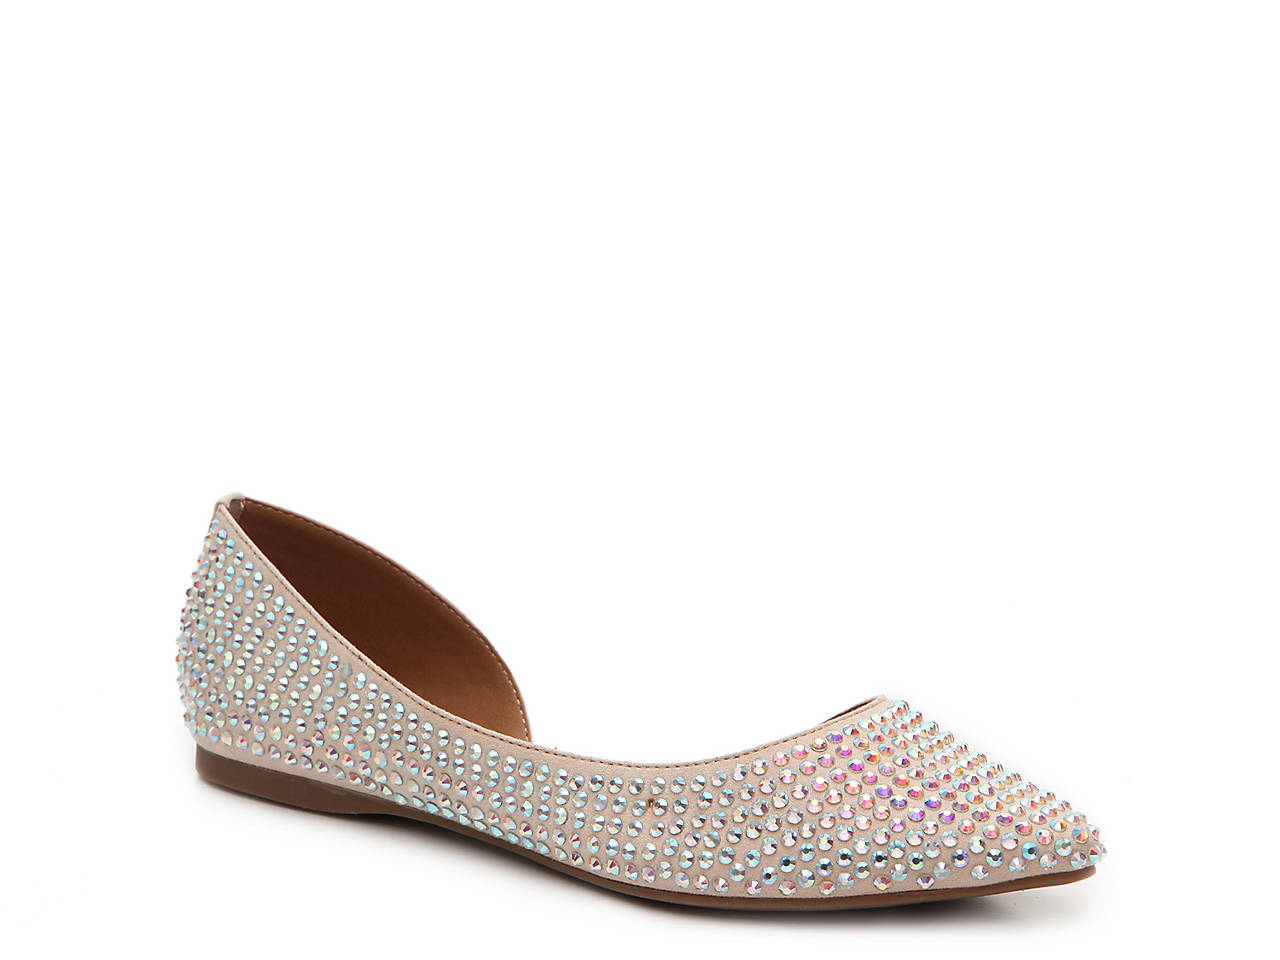 b5db6942d486 Steve Madden Evelina Flat Women s Shoes